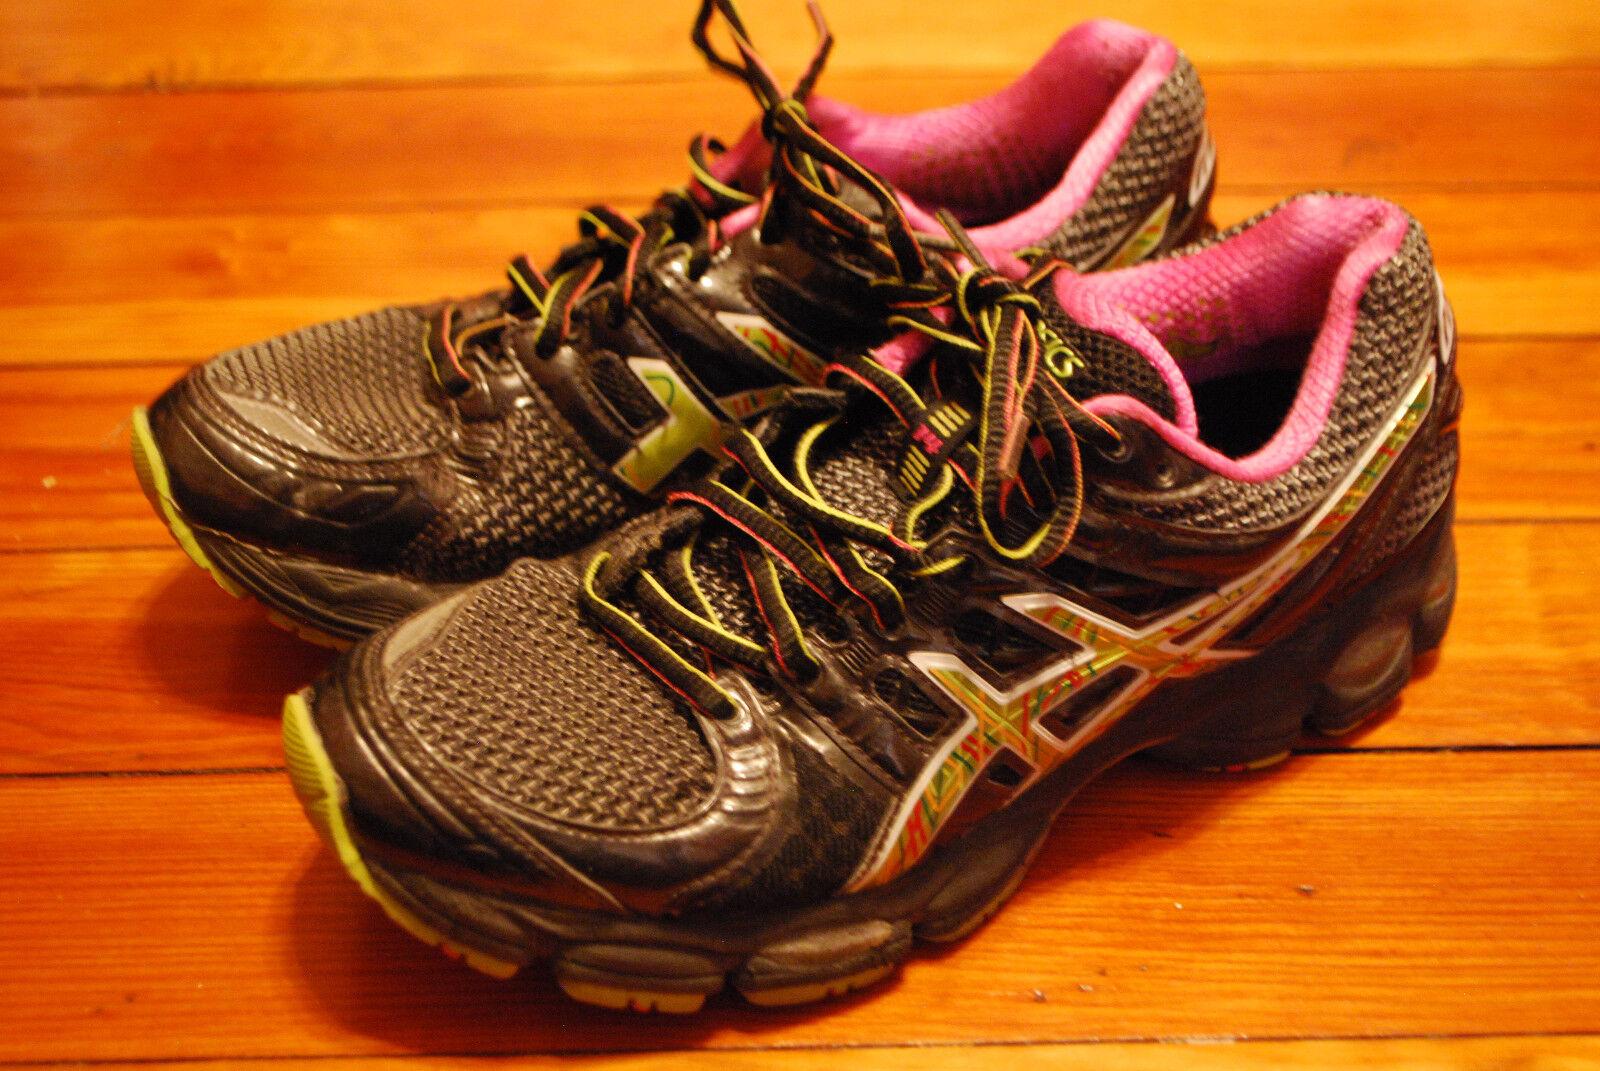 mujeres violet Reebok ZapatosAthlétiques Couleur Noir Negro/vicious violet mujeres Taille 38 ff14df